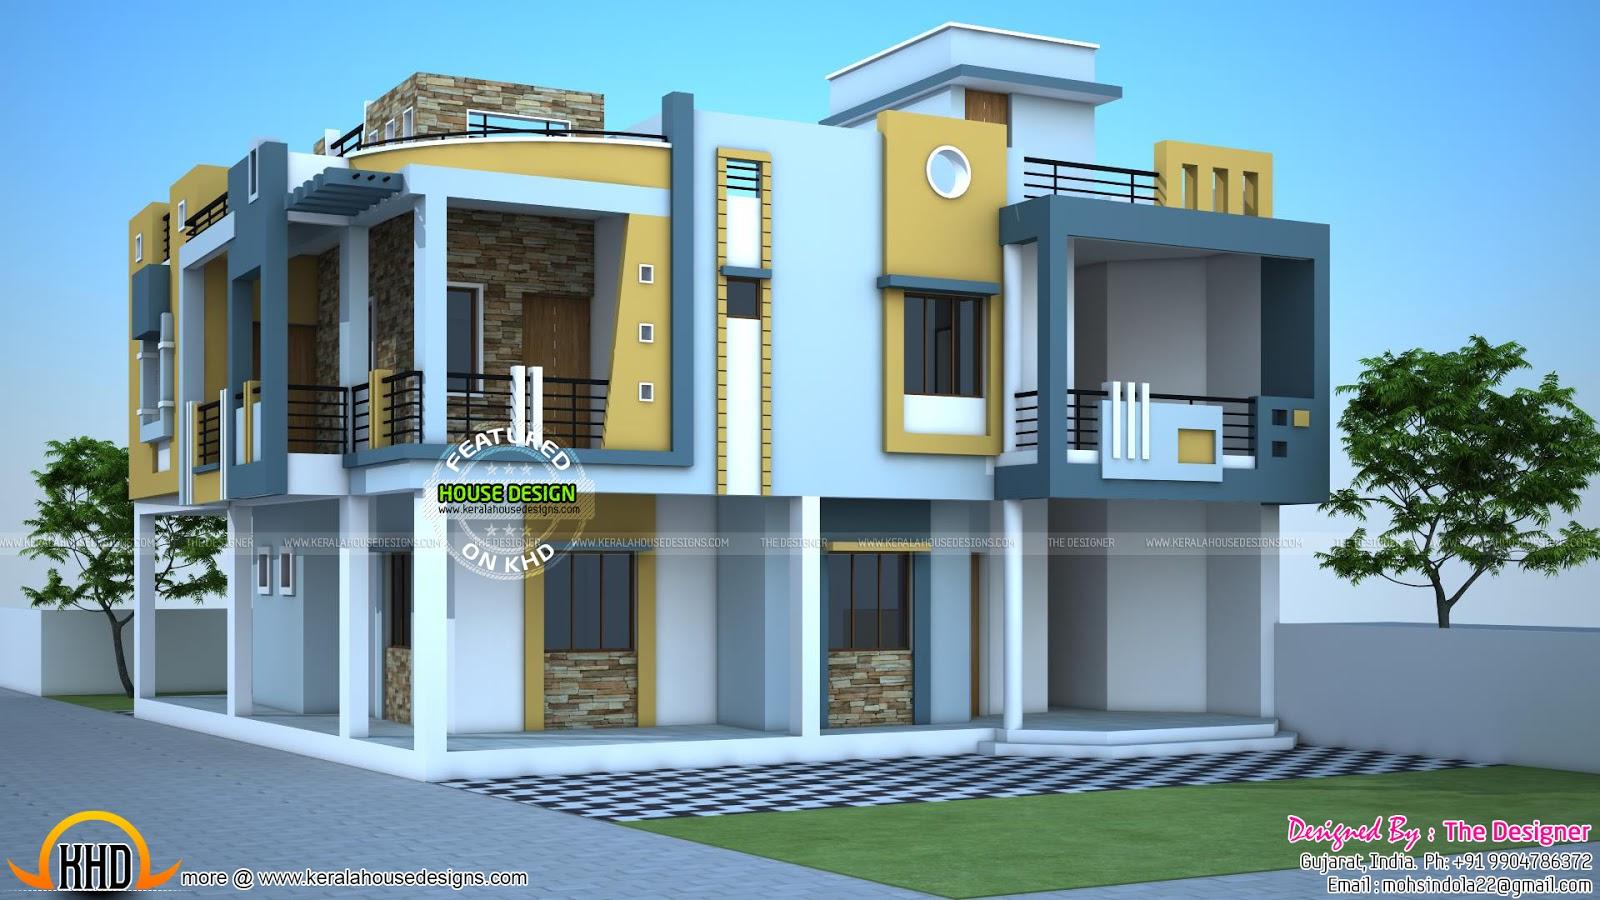 nigeria duplex house plans design home modern house plans modern duplex house plans narrow duplex house plans duplex